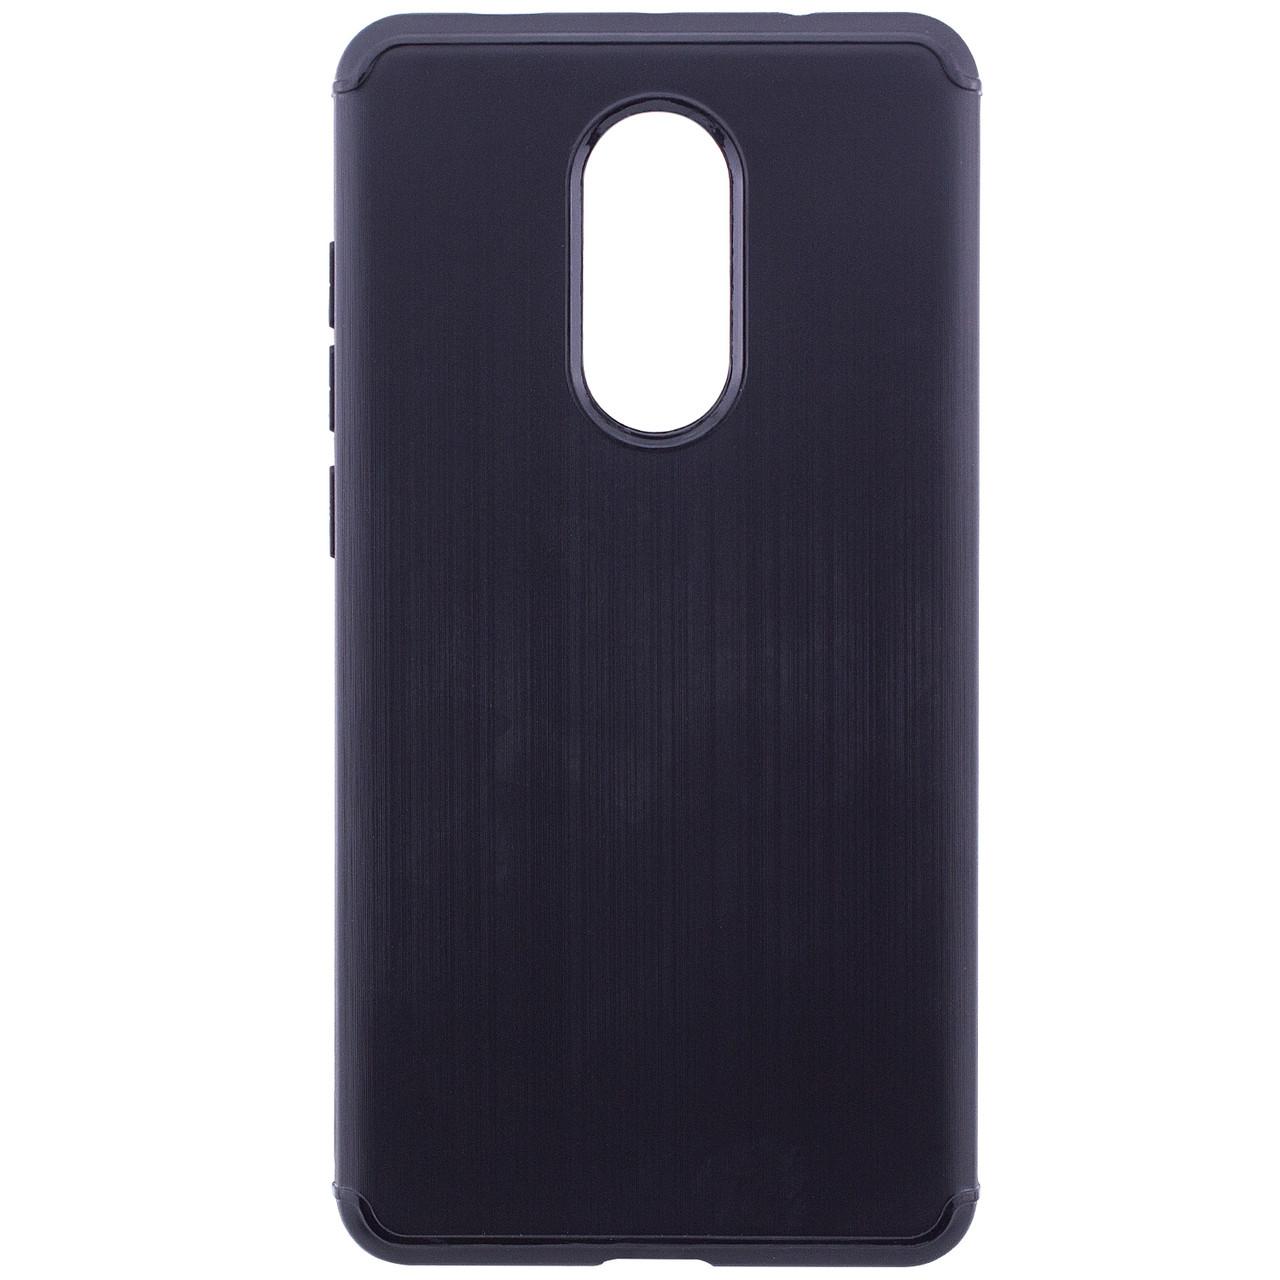 TPU чехол Metal для Xiaomi Redmi Note 4X / Note 4 (Snapdragon) (Черный)